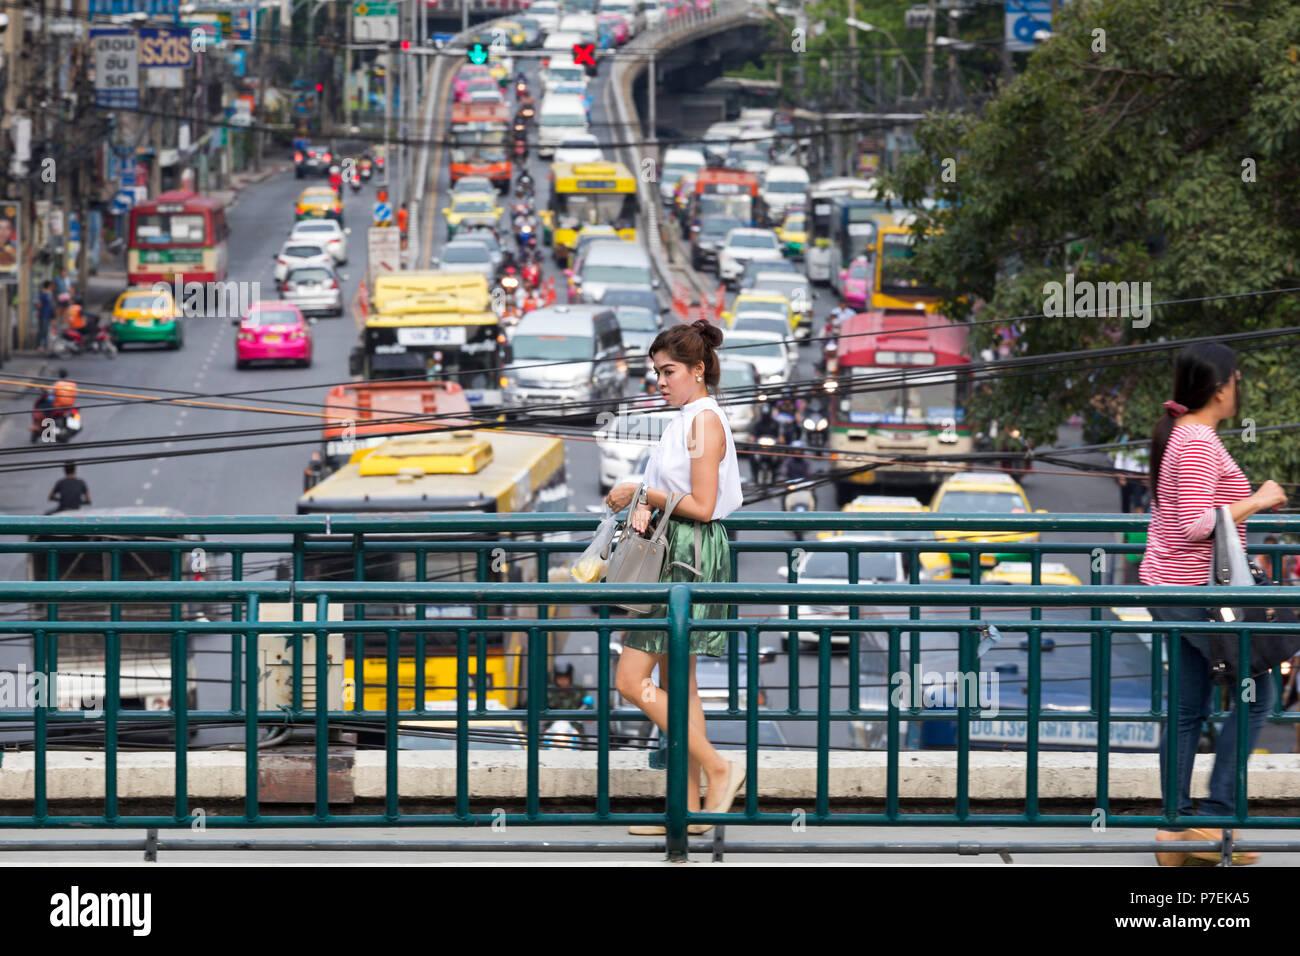 Pedestrian footbridge and traffic congestion in Bangkok, Thailand - Stock Image